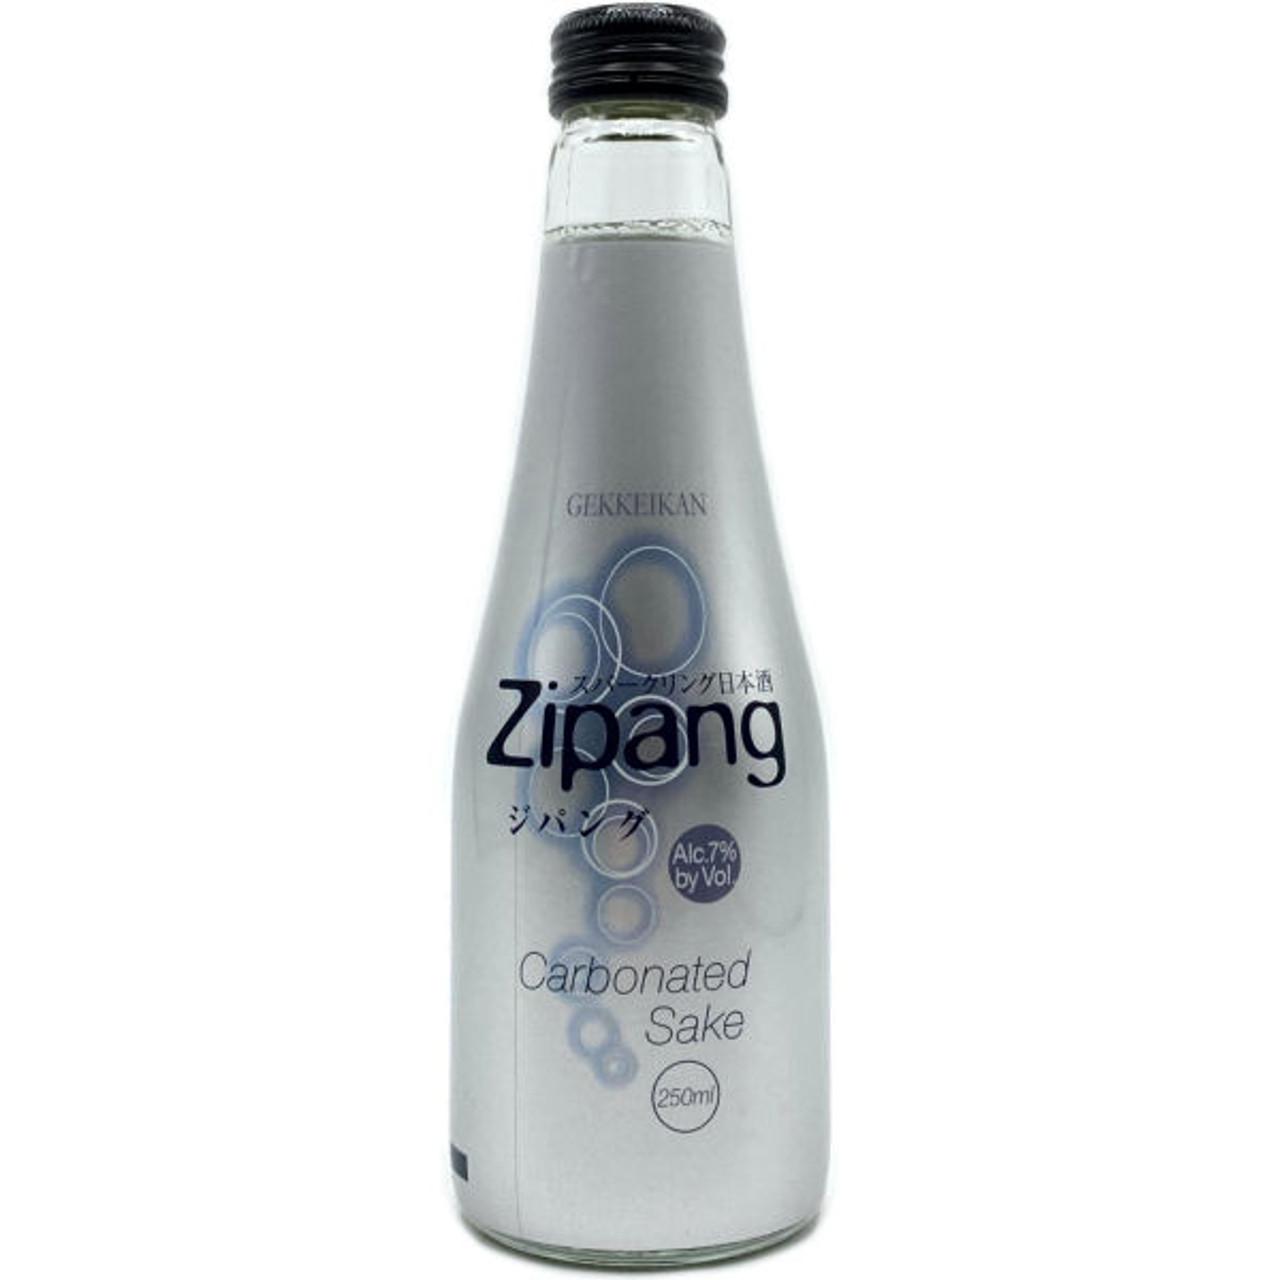 Gekkeikan Zipang Junmai Sparkling Sake (Japan) 250ML